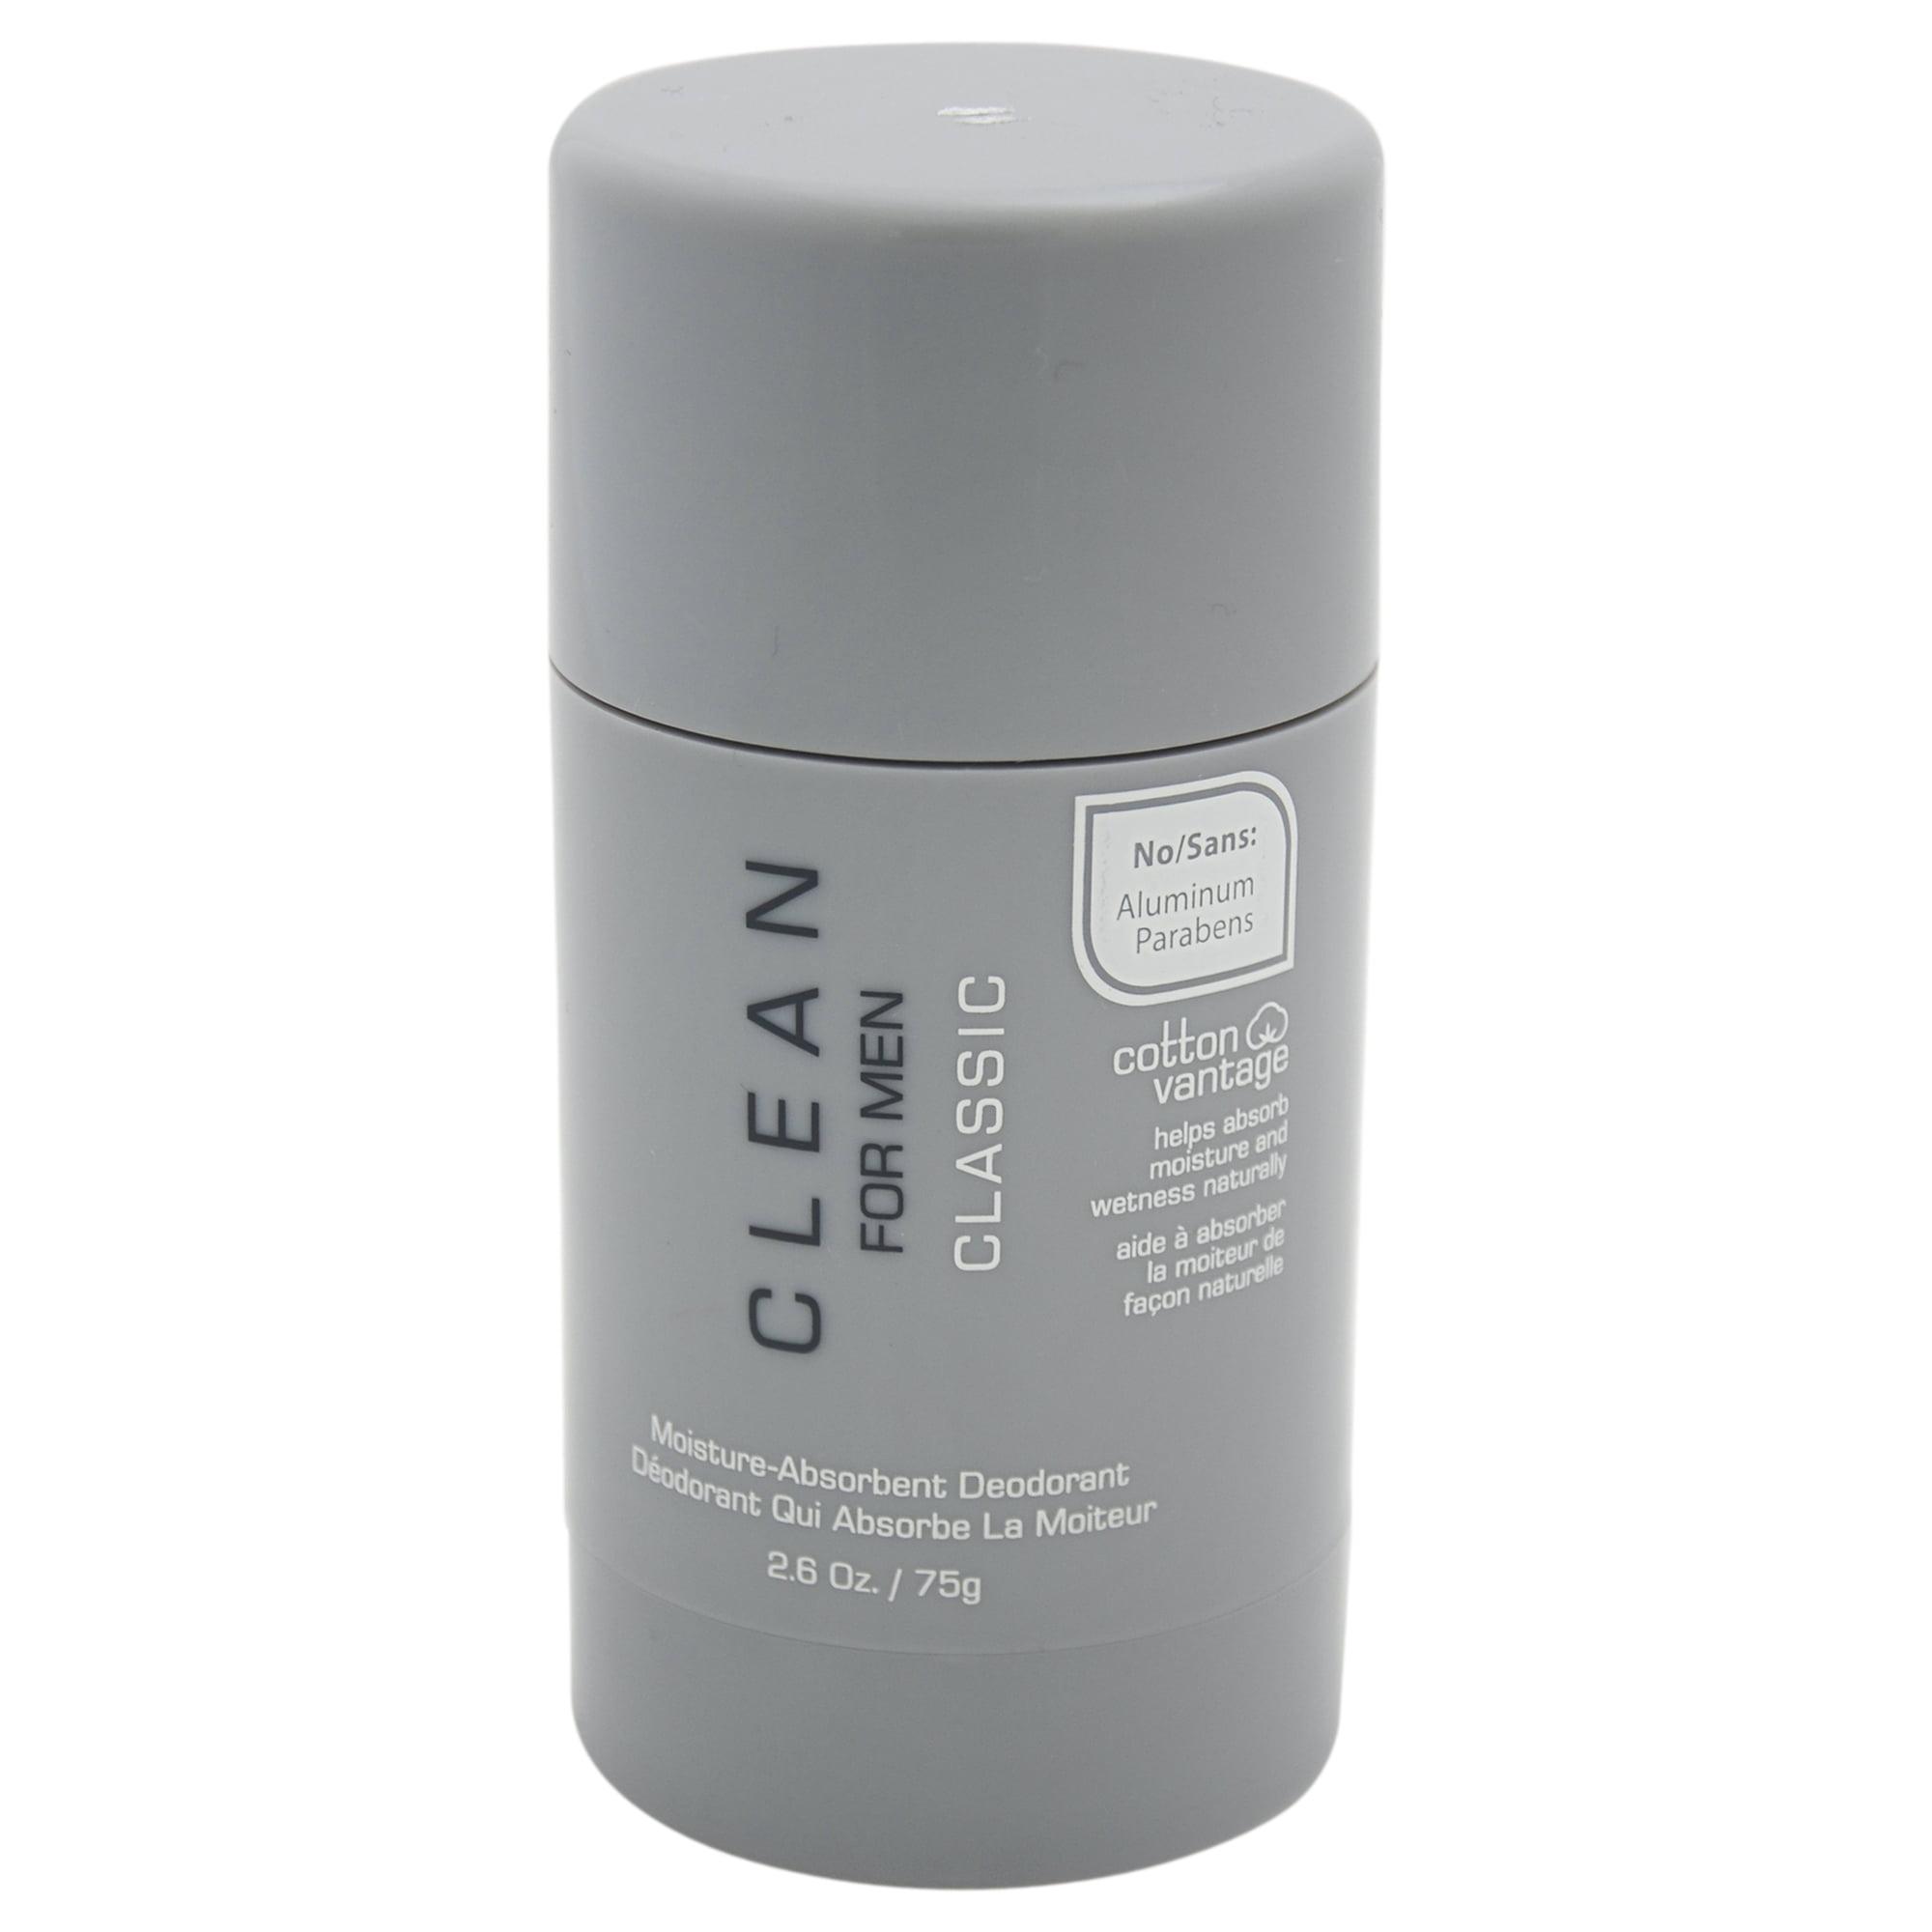 Classic Moisture-Absorbent Deodorant Stick by Clean for Men - 2.6 oz Deodorant Stick